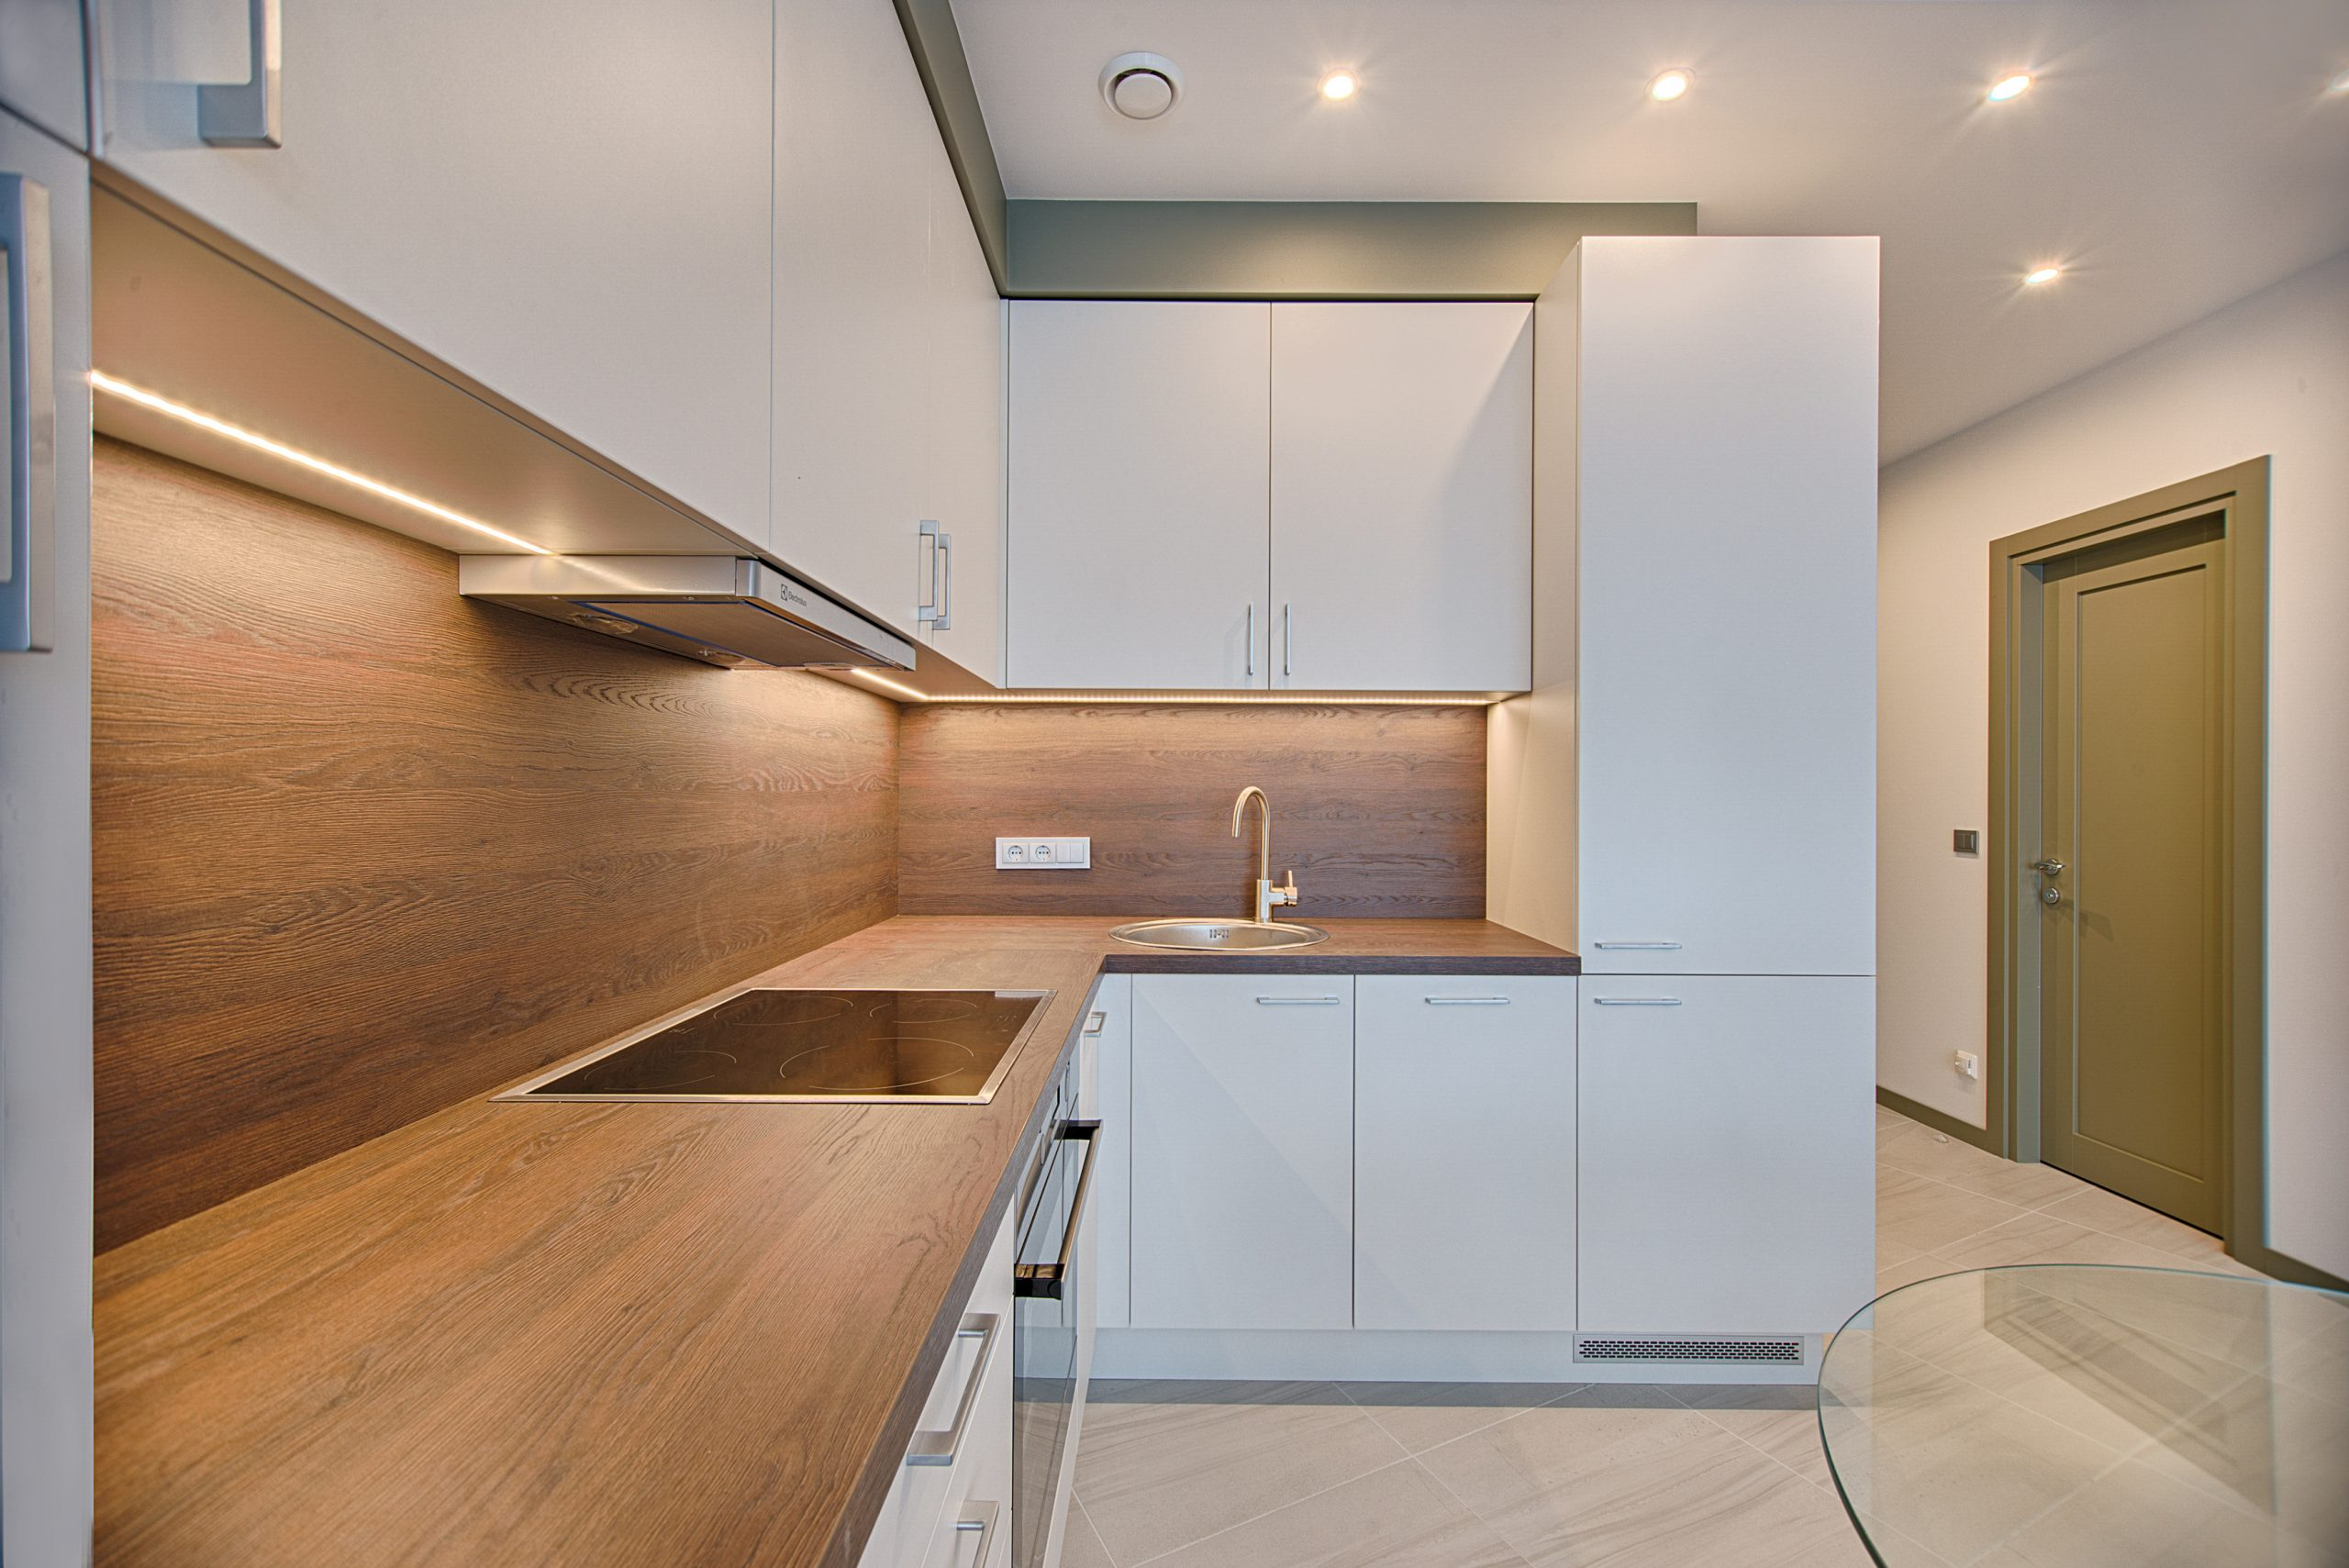 white-wooden-modular-kitchen-1643384